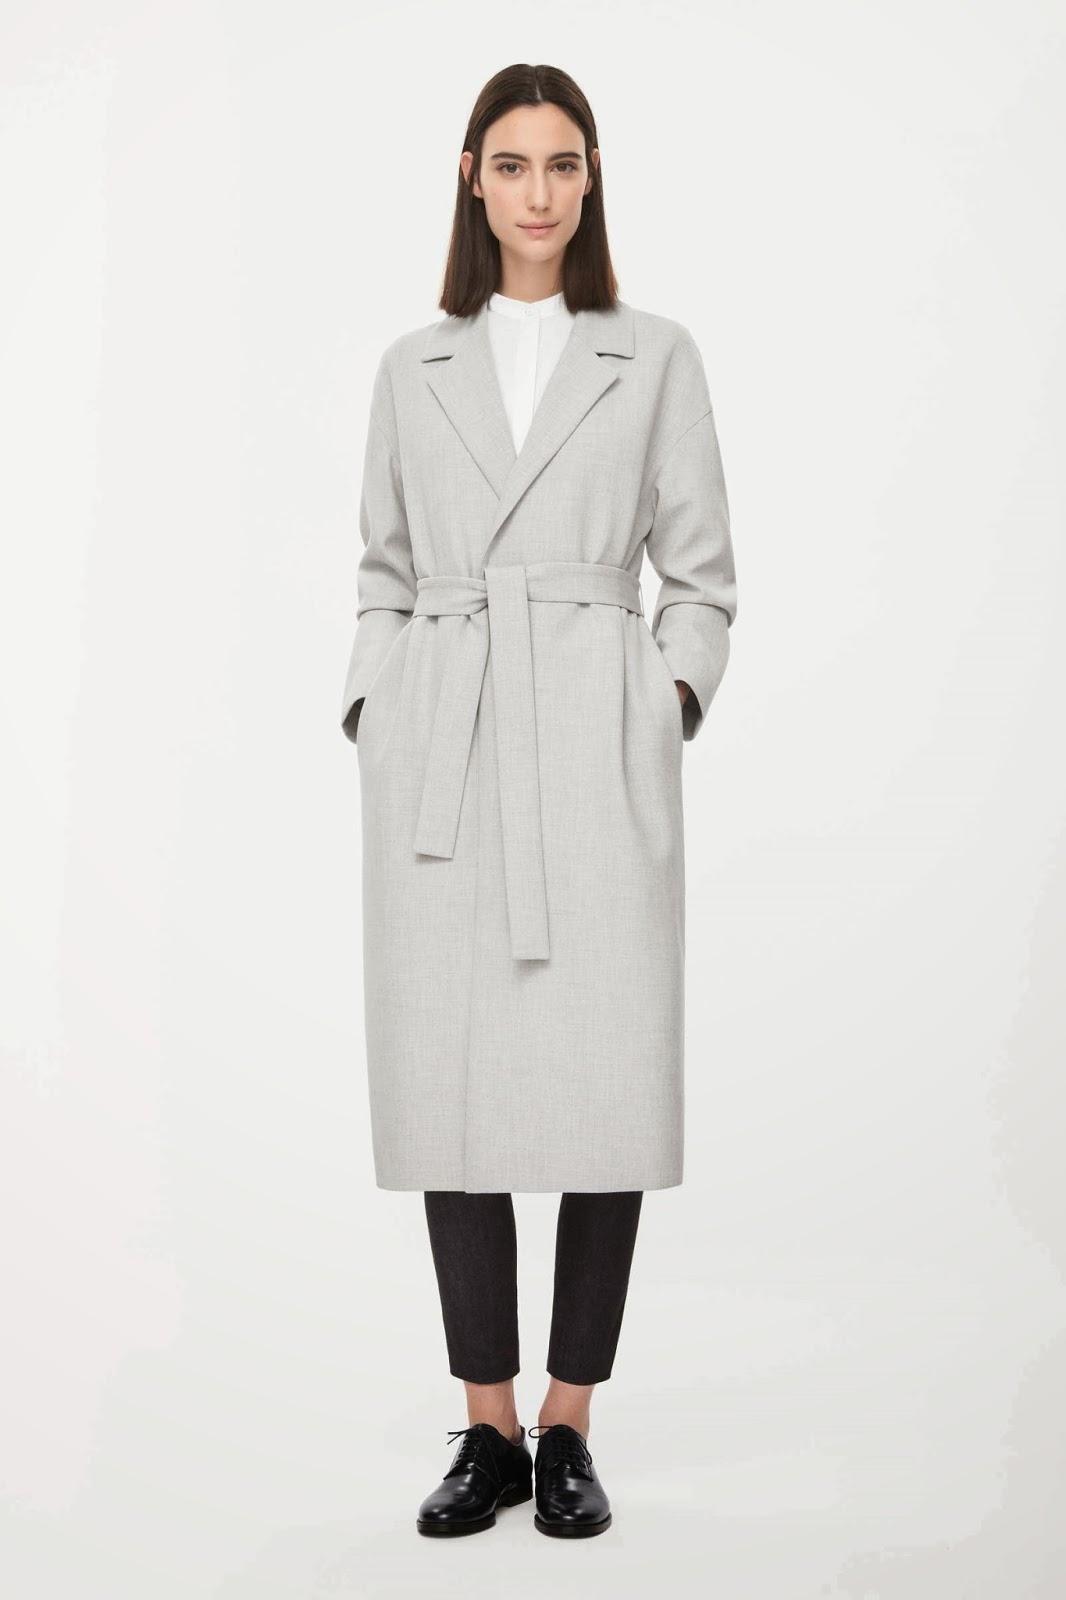 cos grey coat 2015,